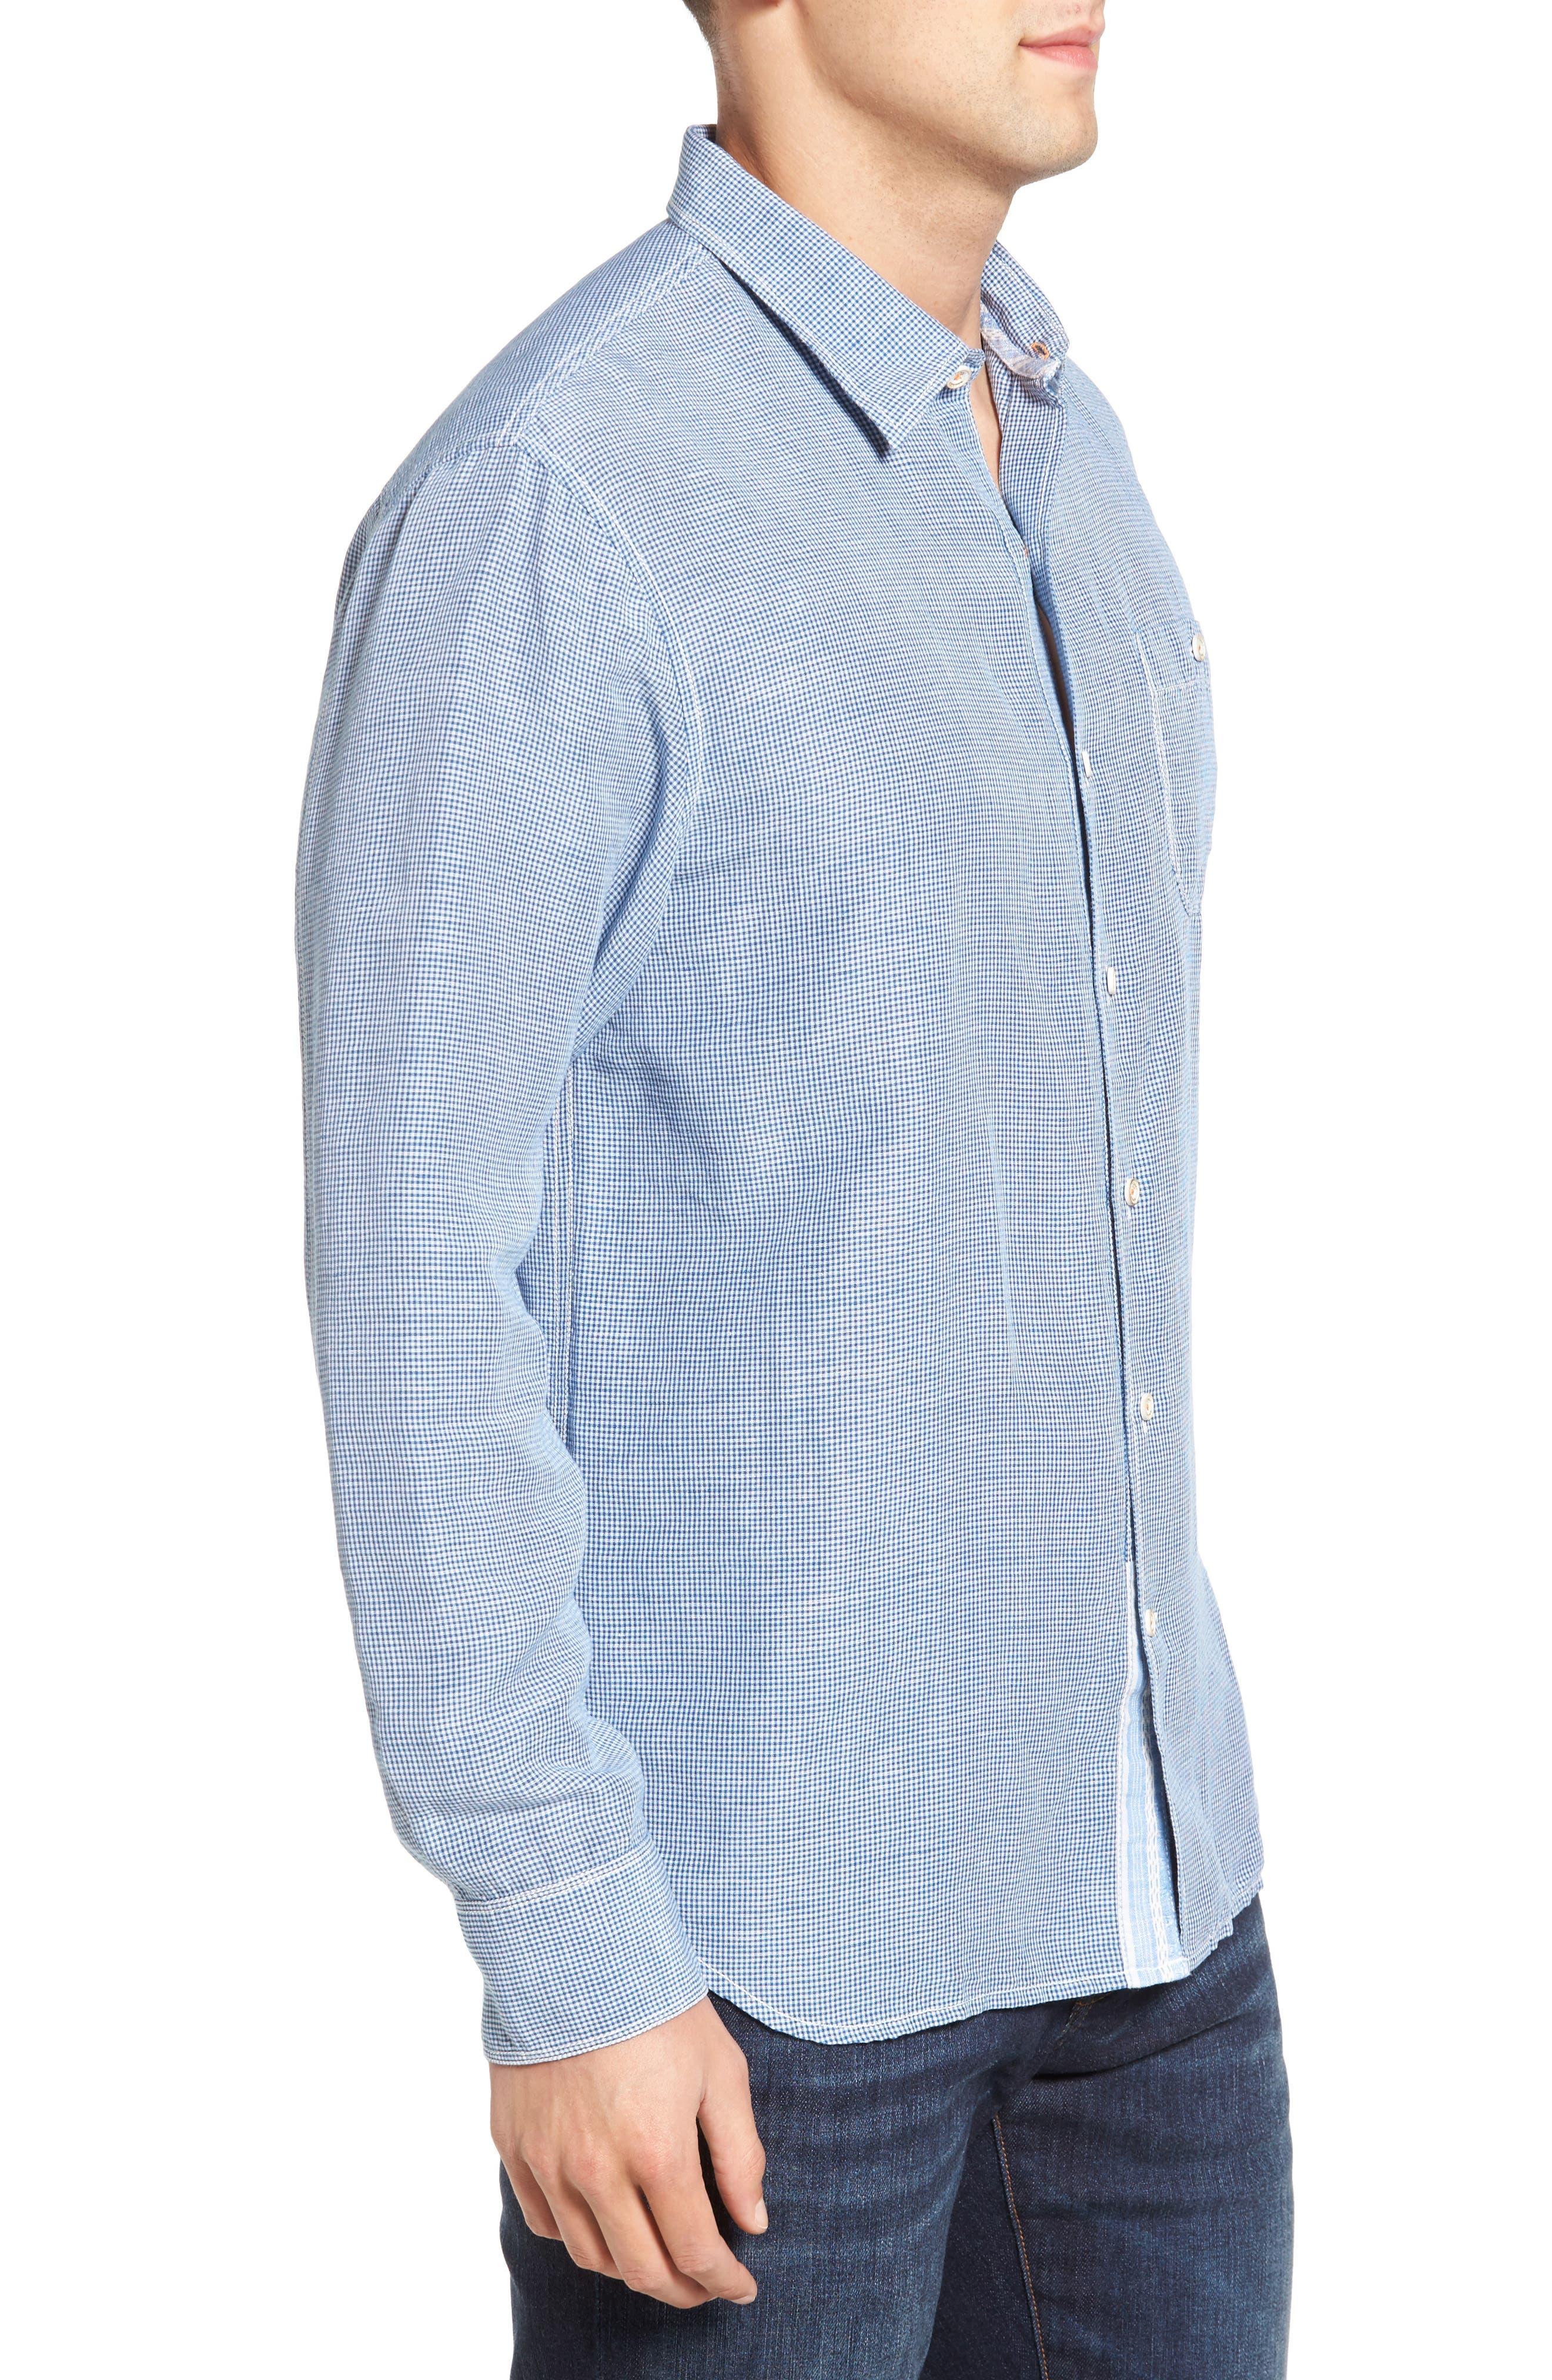 Alternate Image 3  - Tommy Bahama Sand Linen Island Modern Fit Sport Shirt